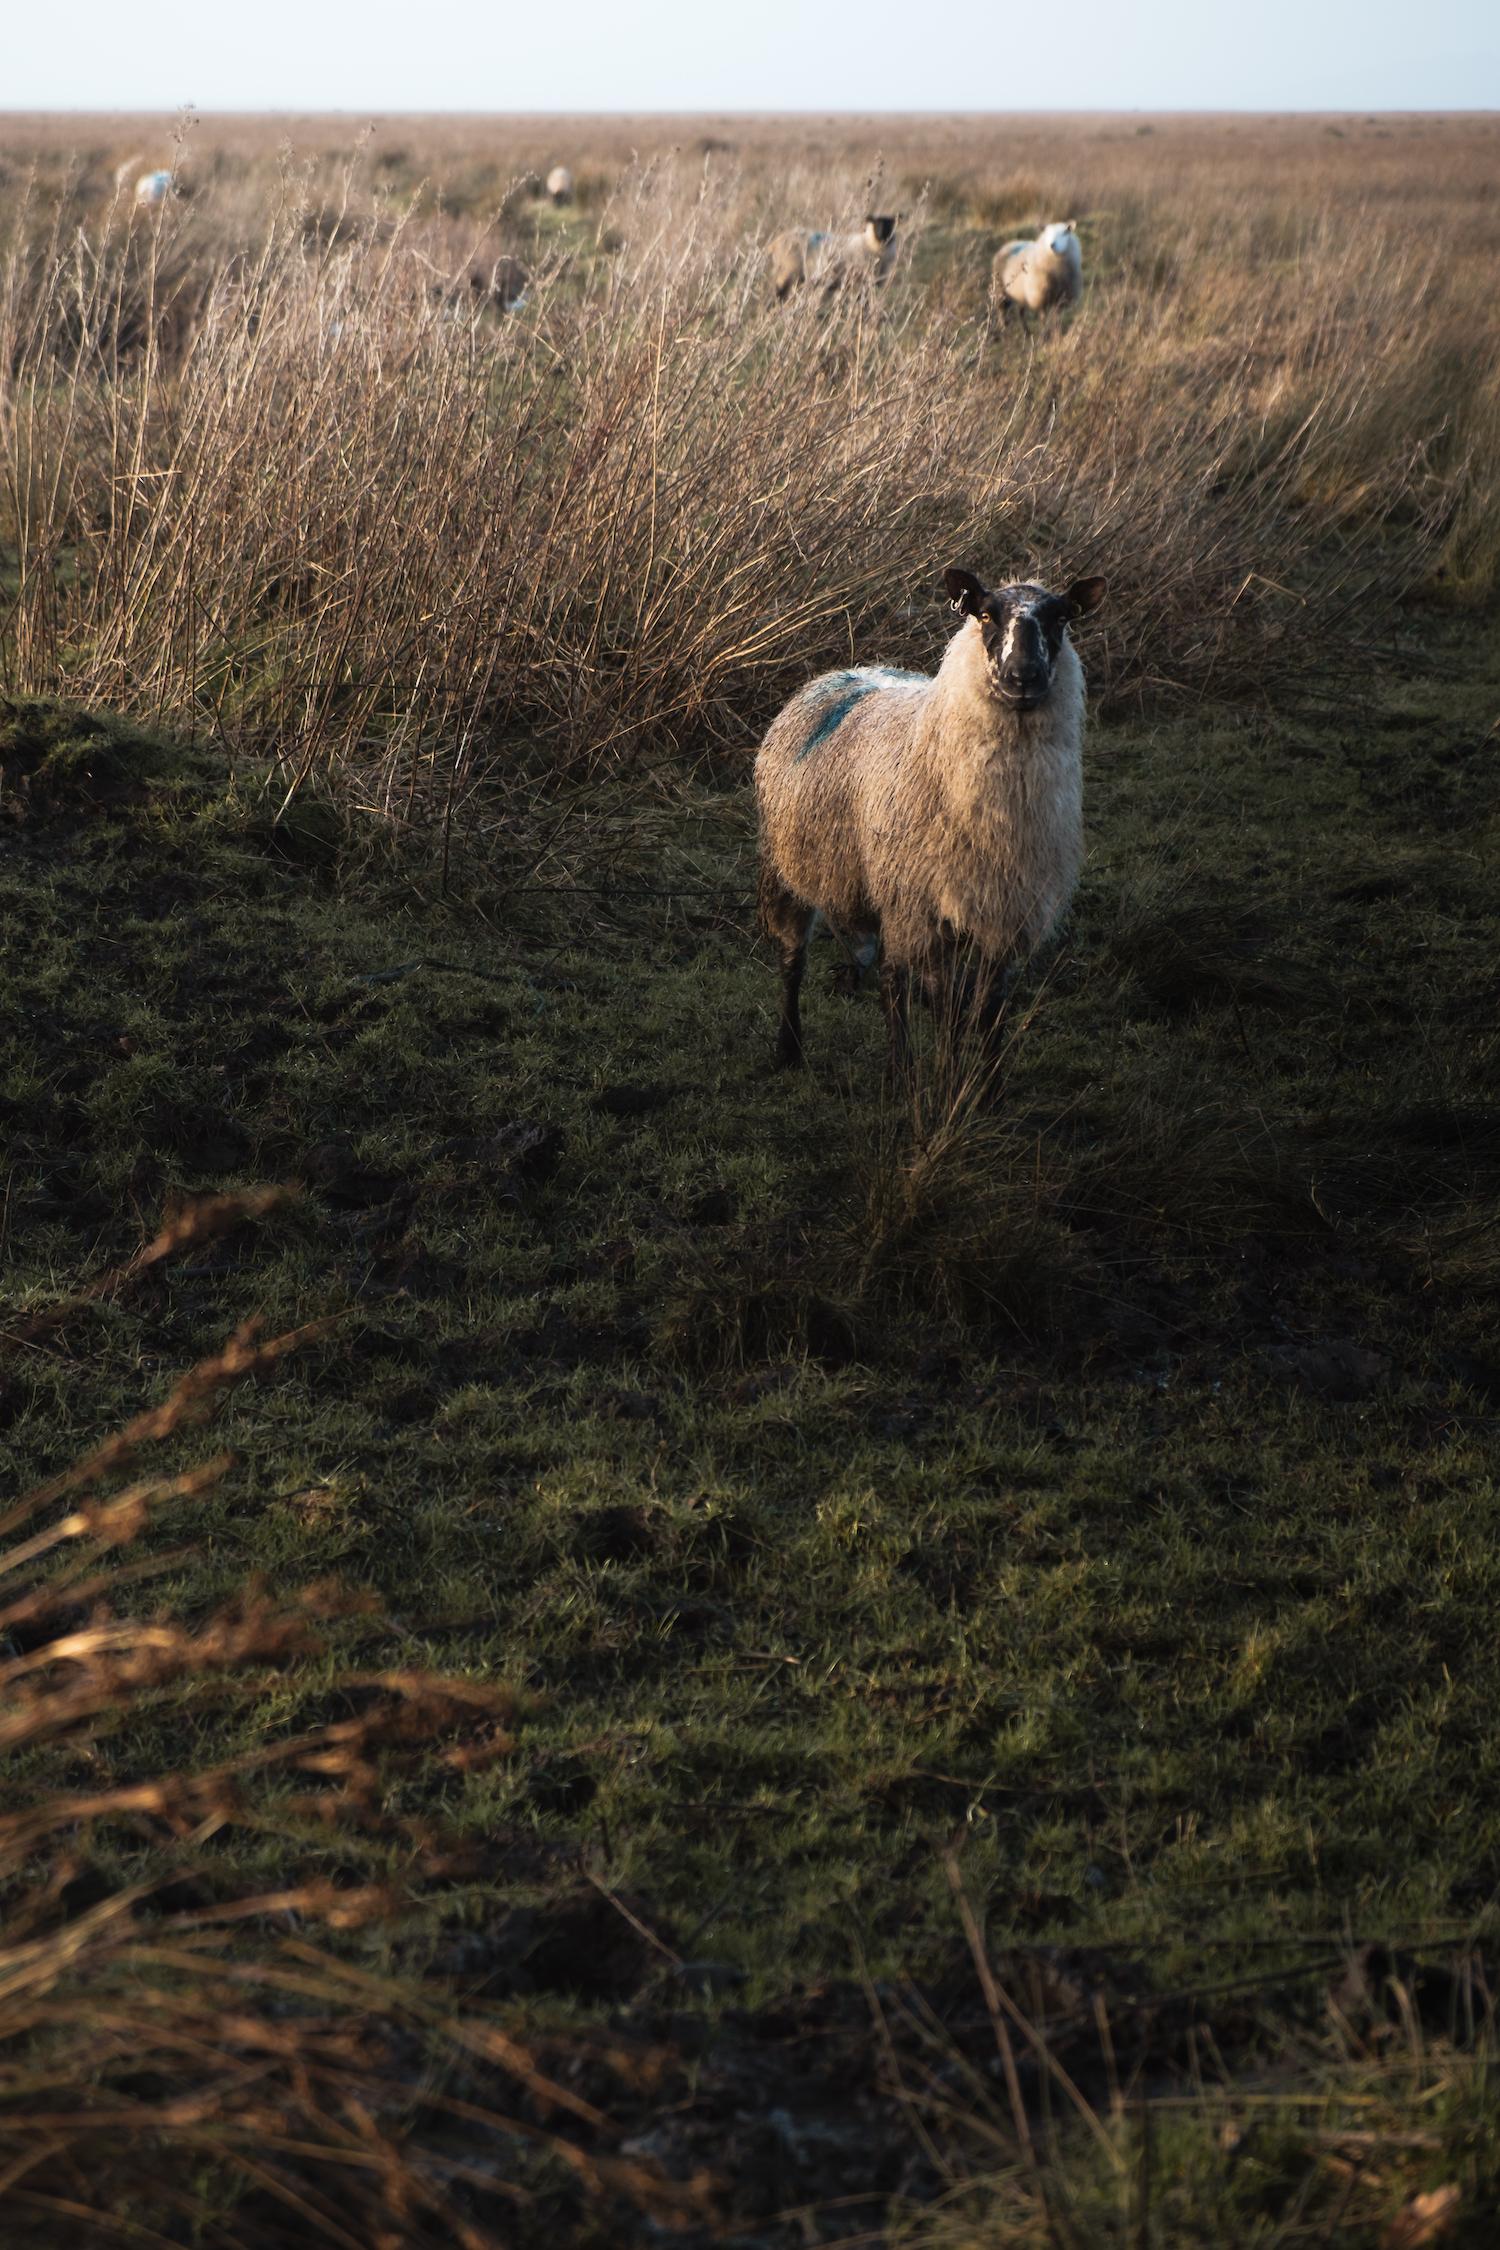 Wild sheep on Llanrhidian Marsh (Gower Peninsula, South Wales).